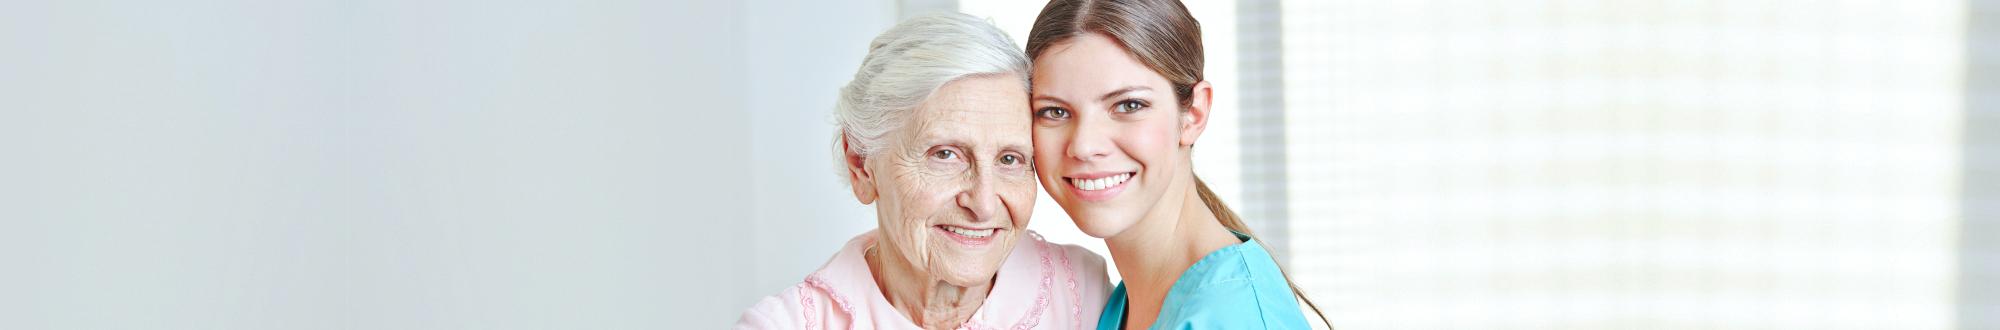 Caregiver embracing happy senior